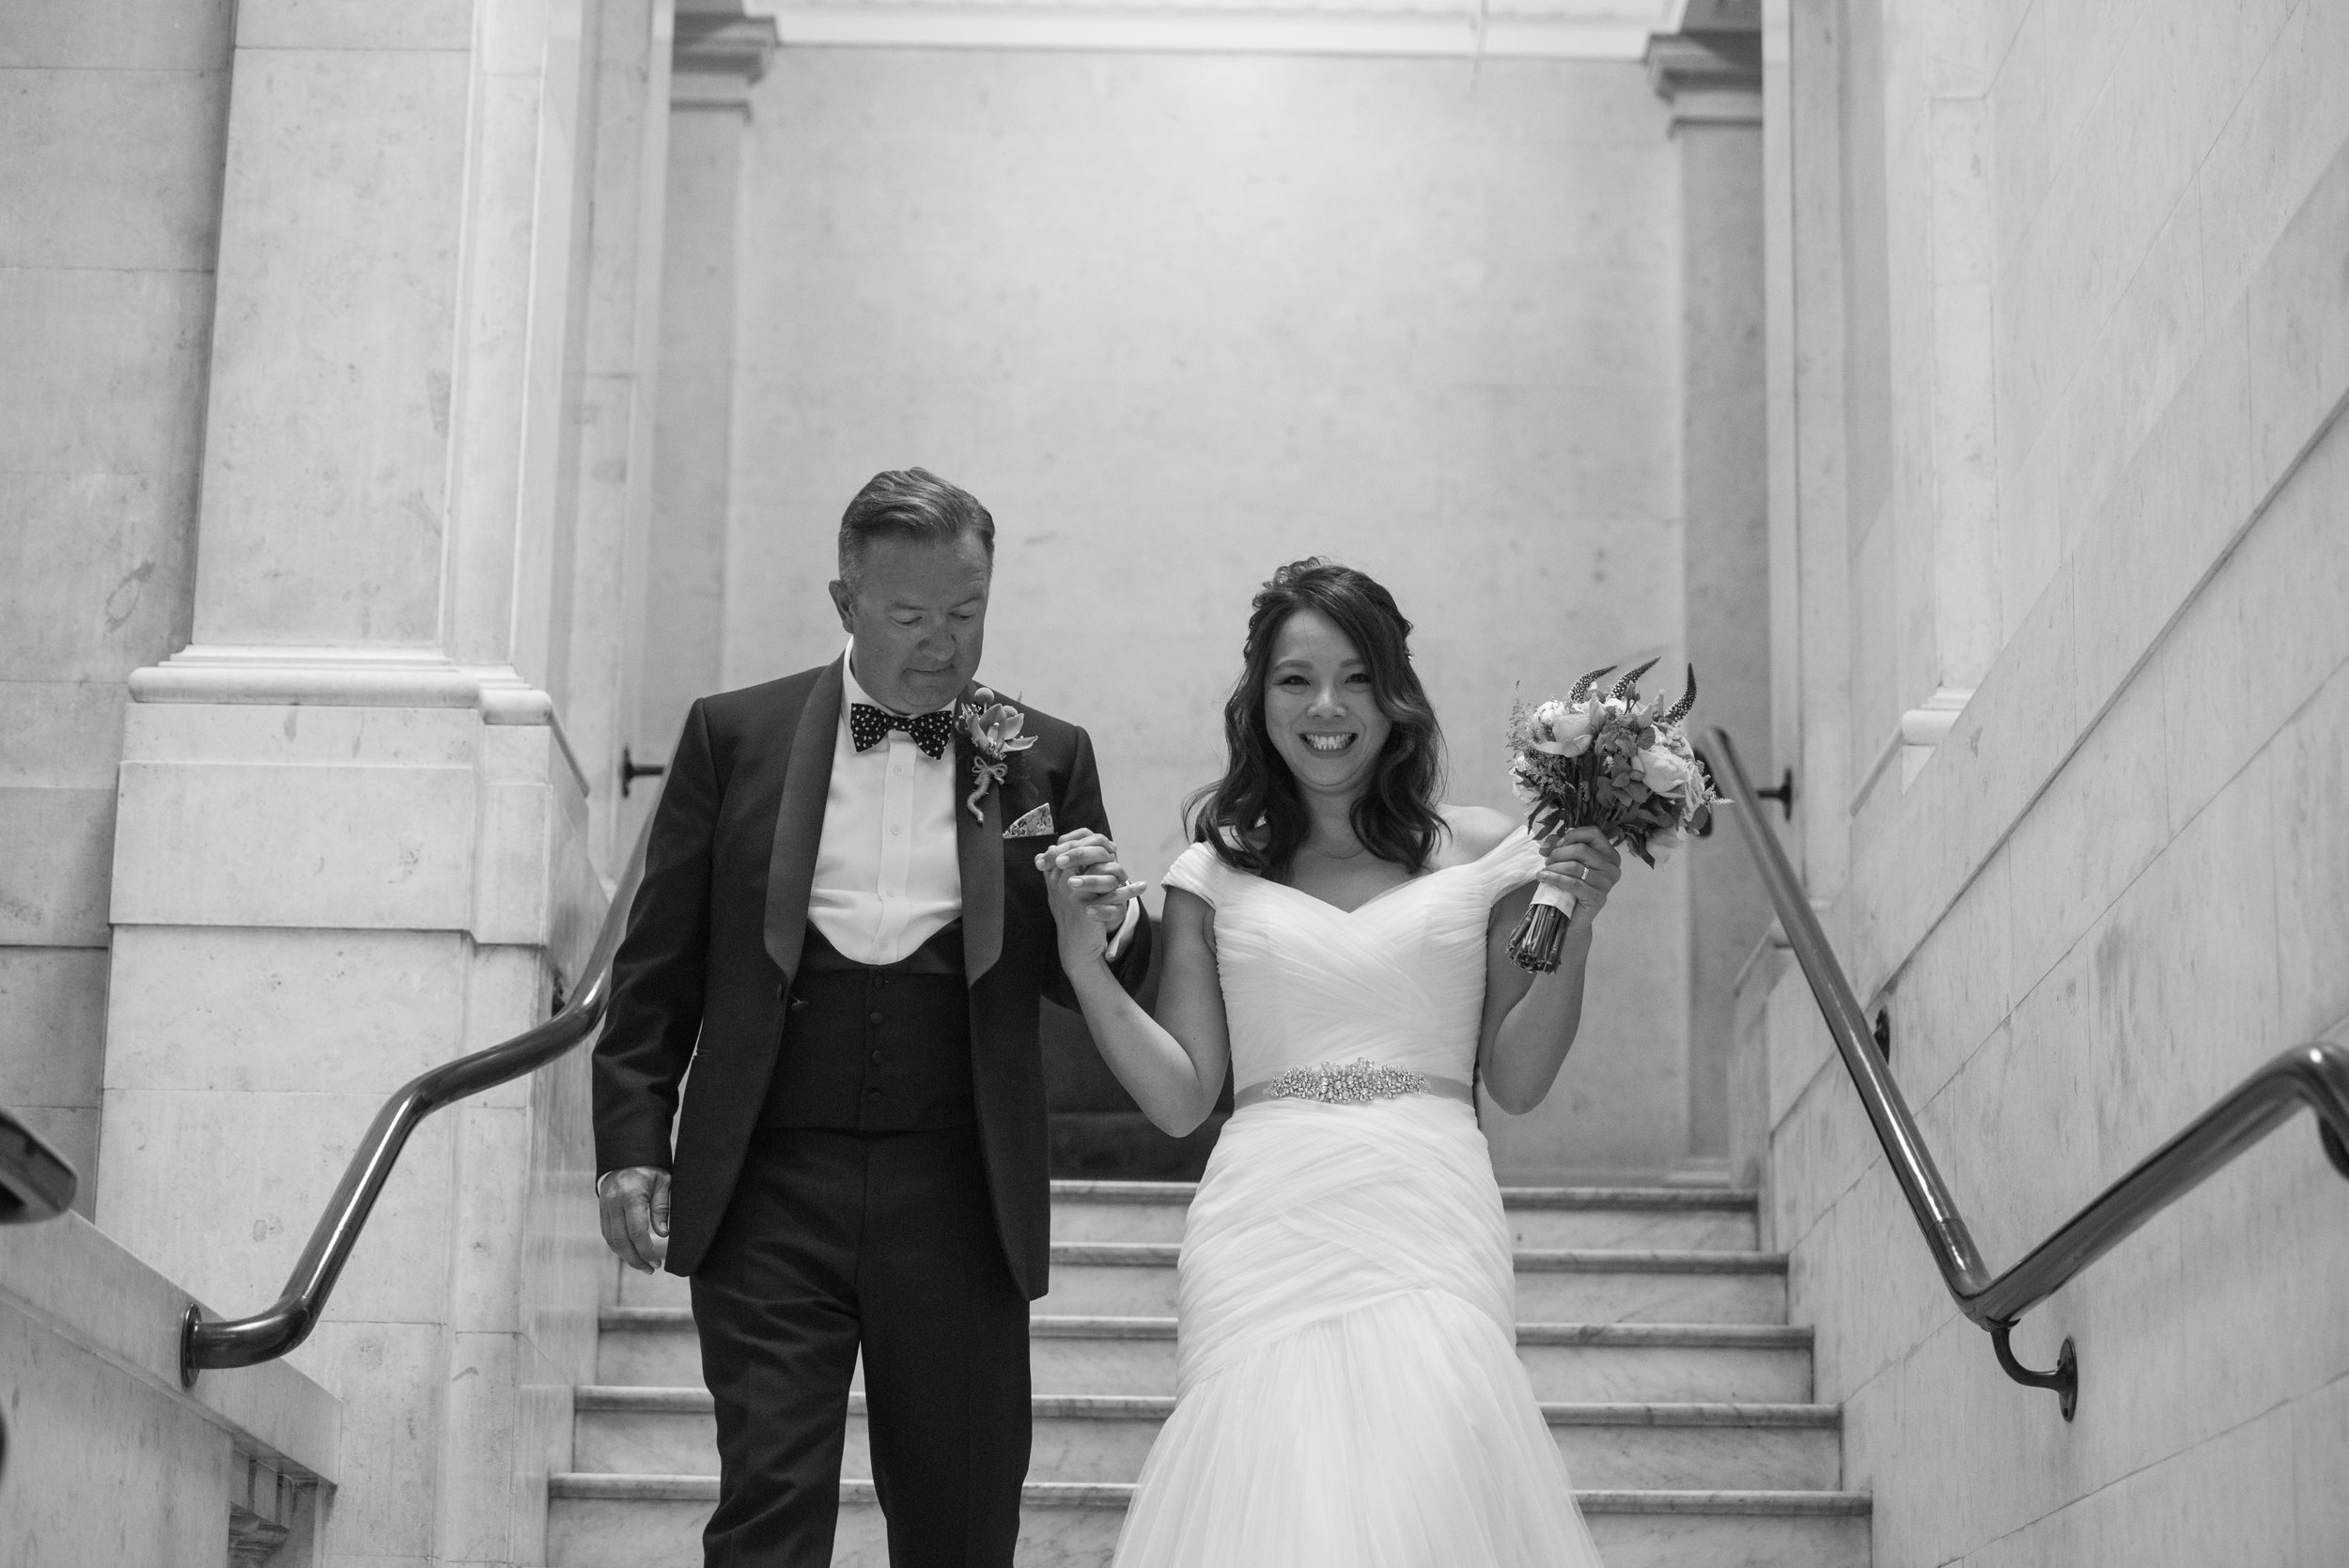 D&M_Marylebone Town Hall Wedding (123 of 239).jpg